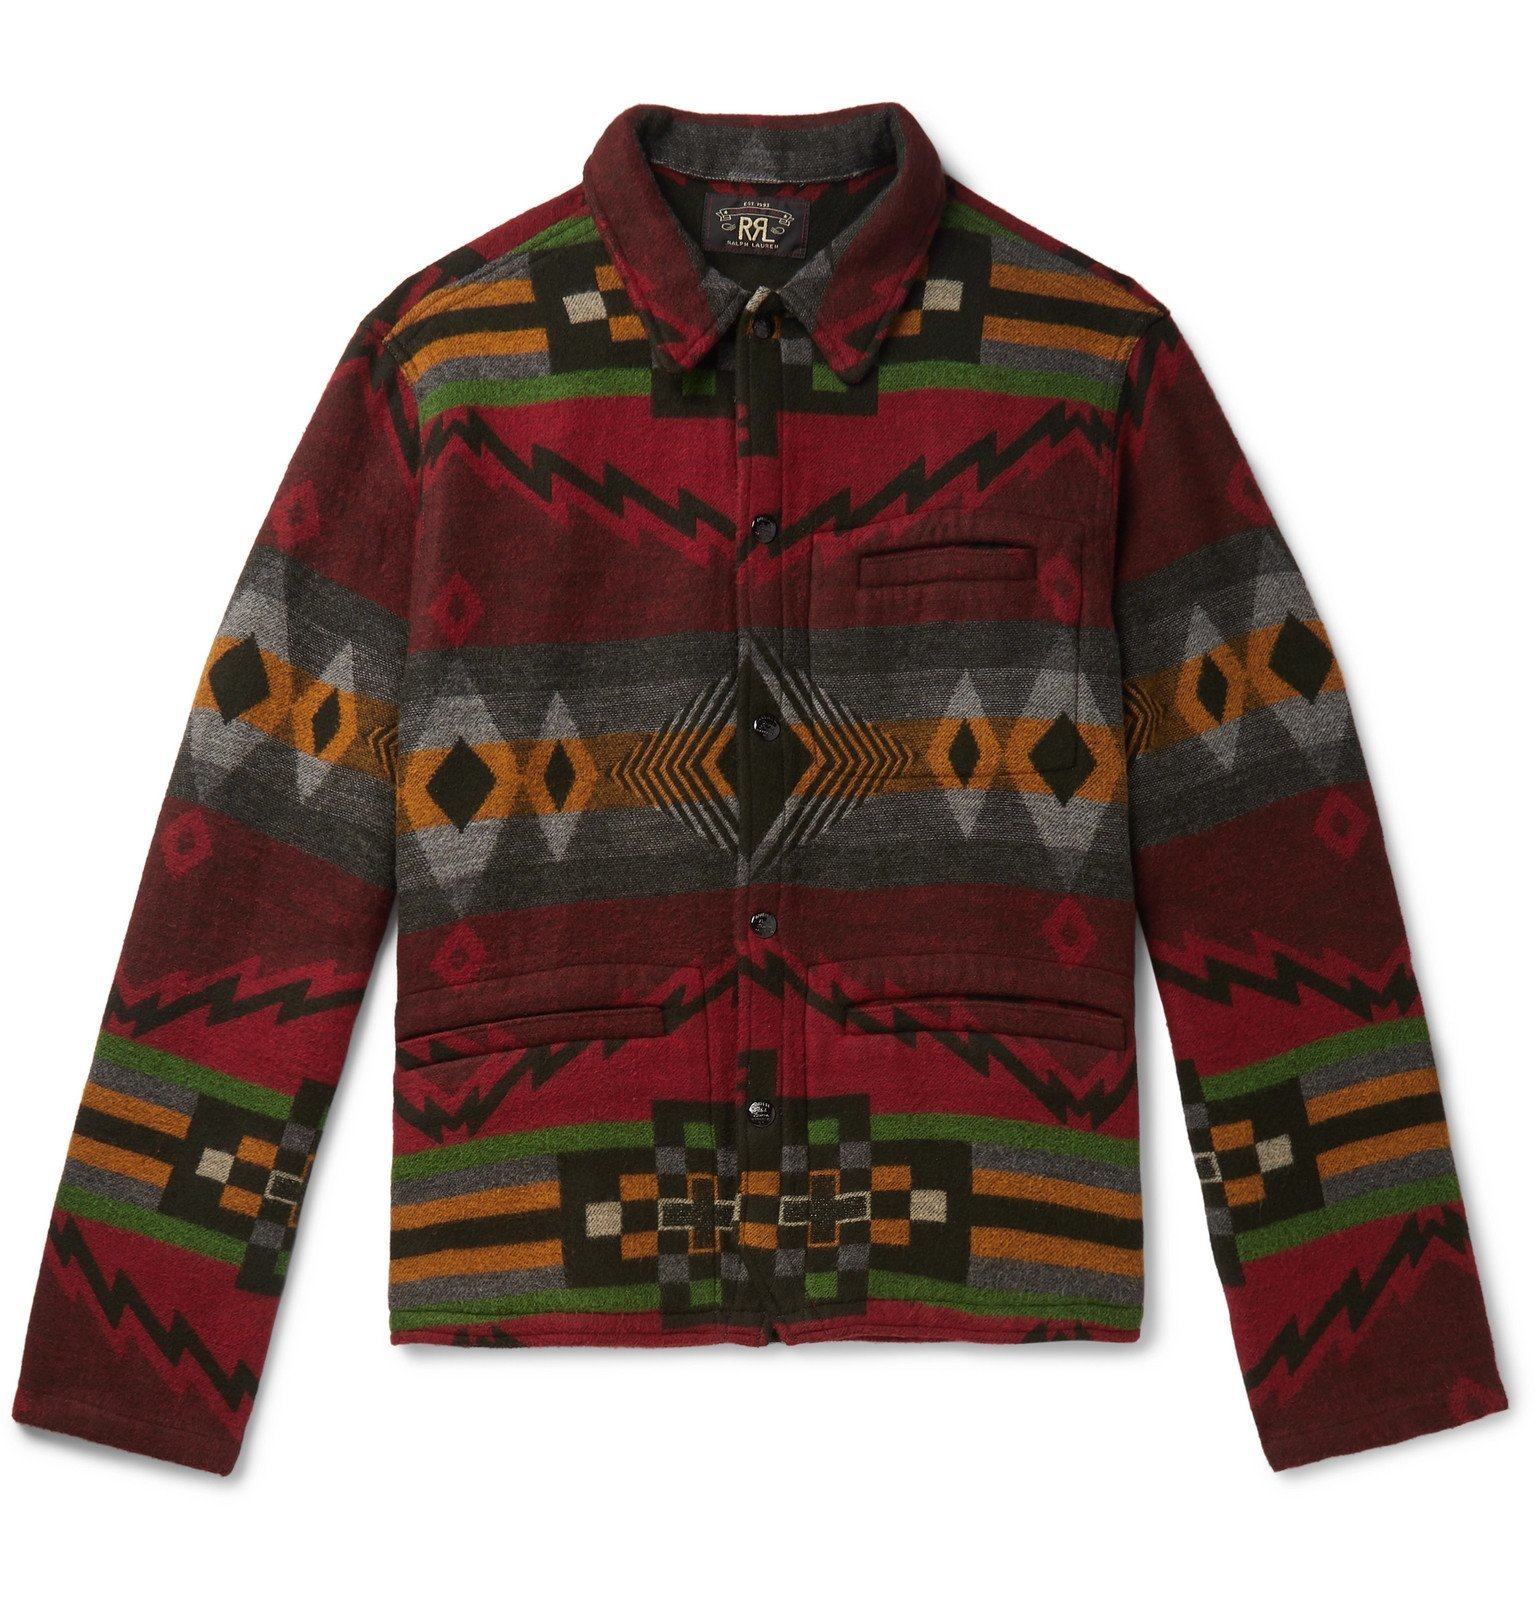 RRL - Brushed Cotton and Wool-Blend Jacquard Overshirt - Multi